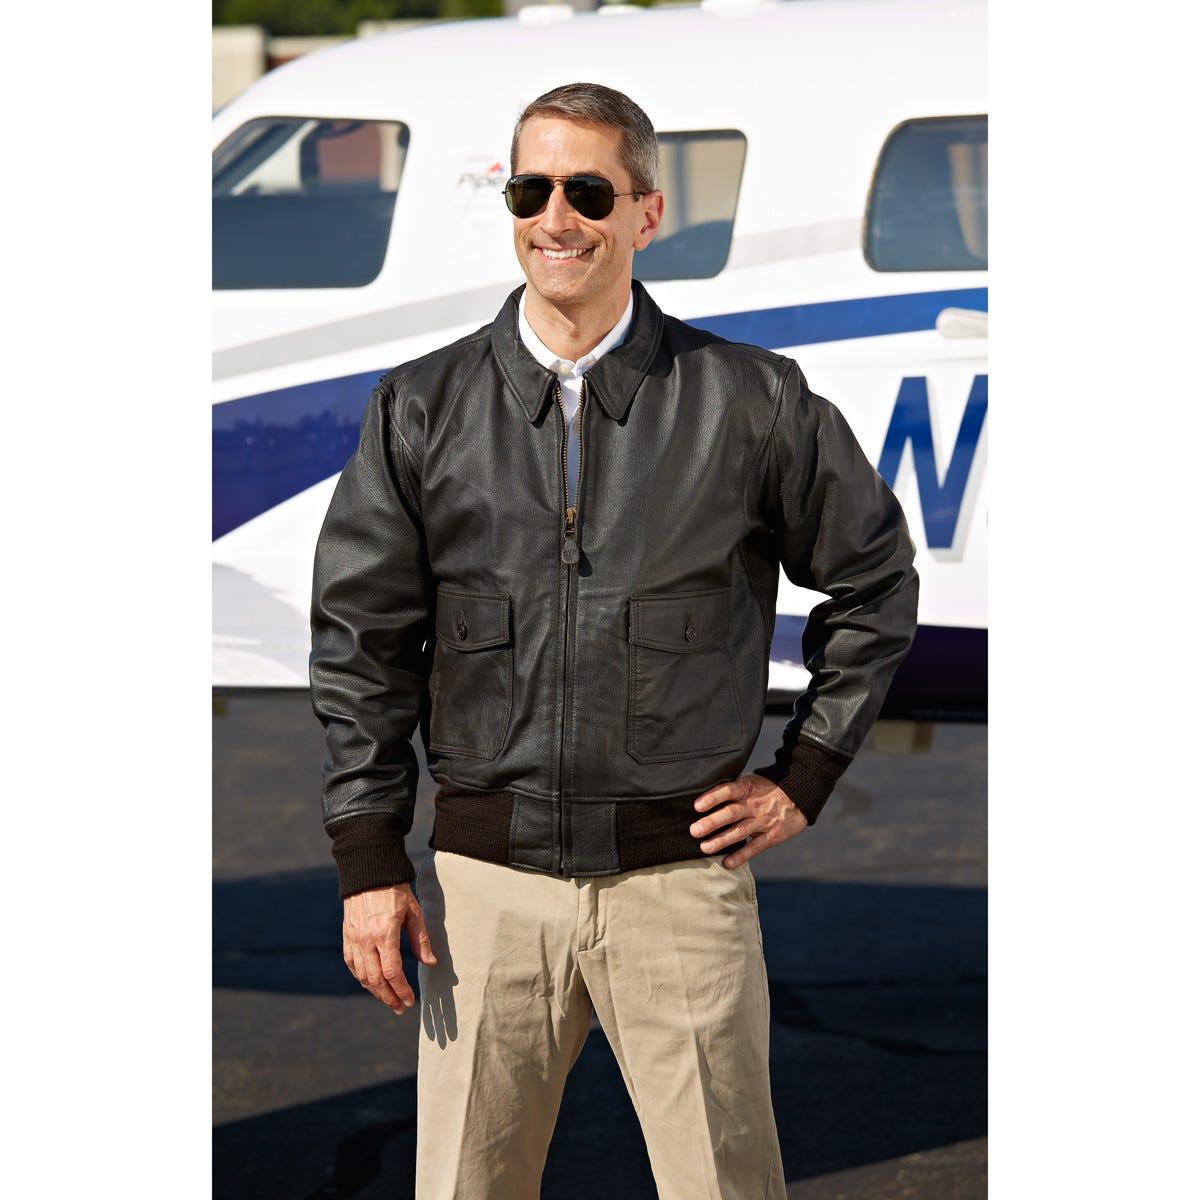 Modern Leather Flight Jacket - from Sporty s Pilot Shop 467e7b8018c